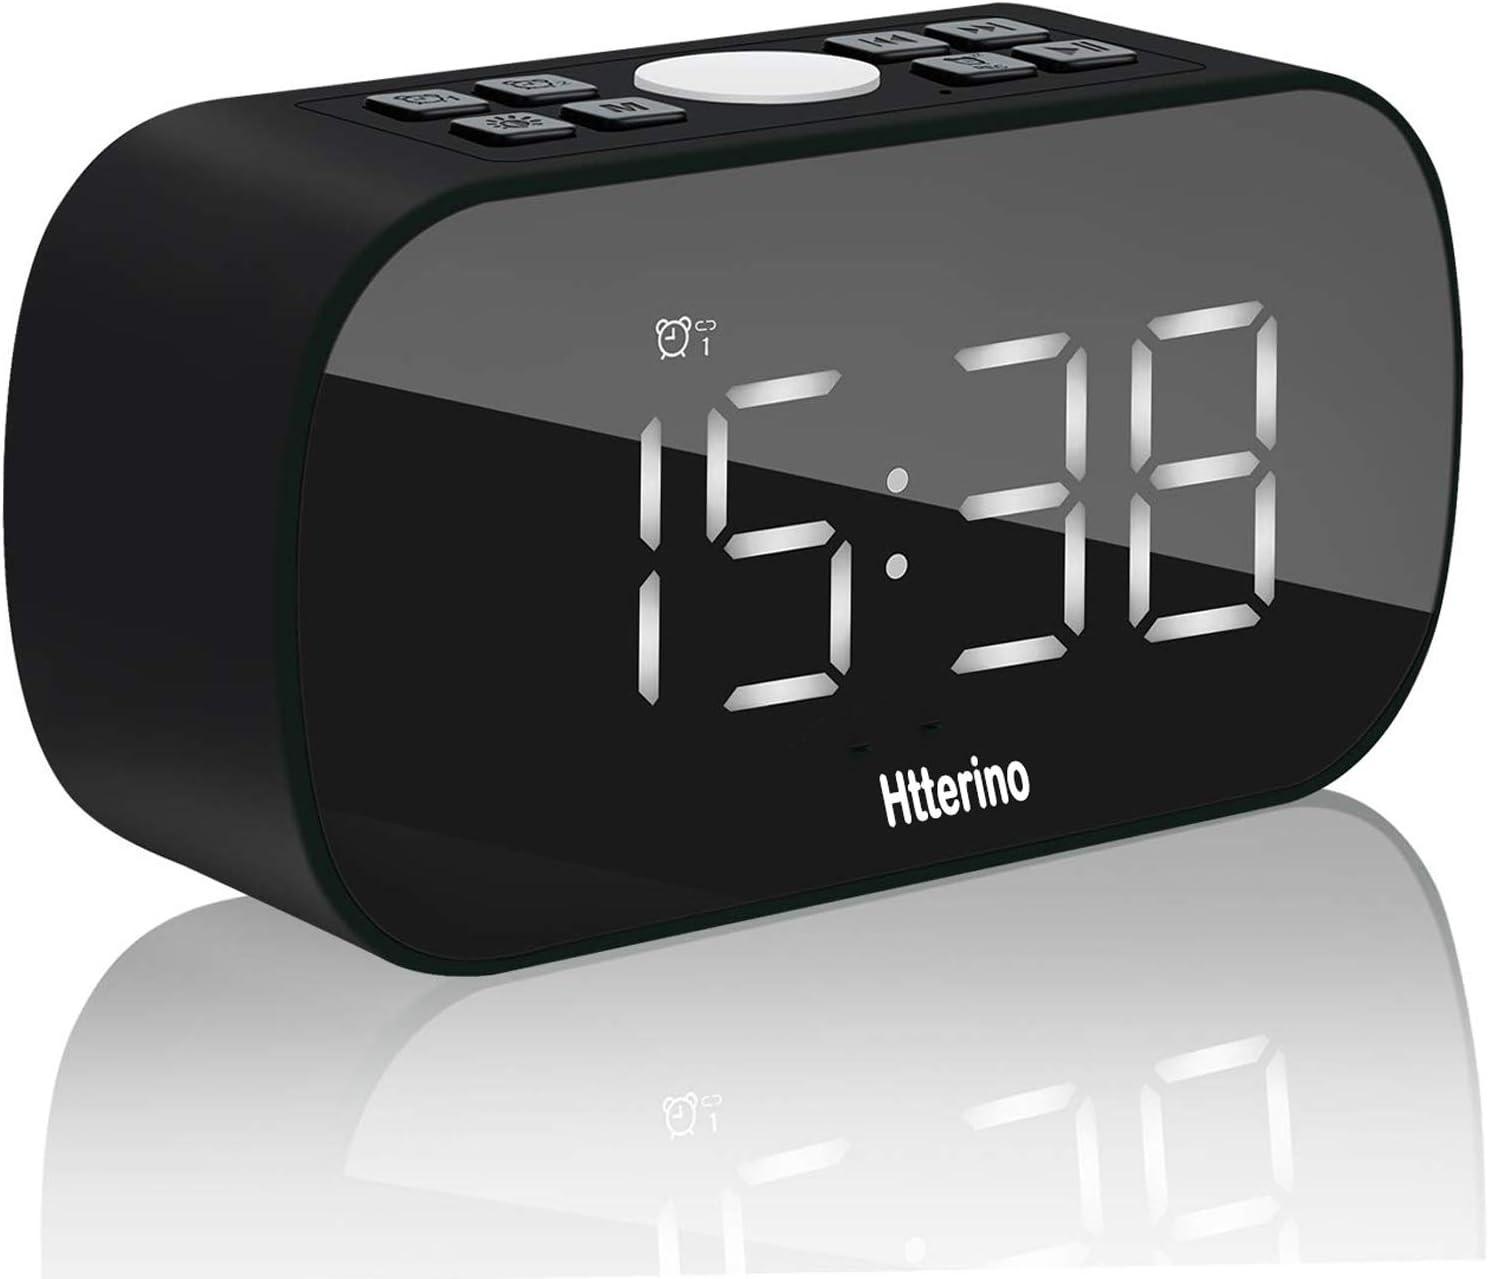 Clock Radios Wireless Bluetooth Speakers Portable Alarm Clock with FM Radio Night Light 5